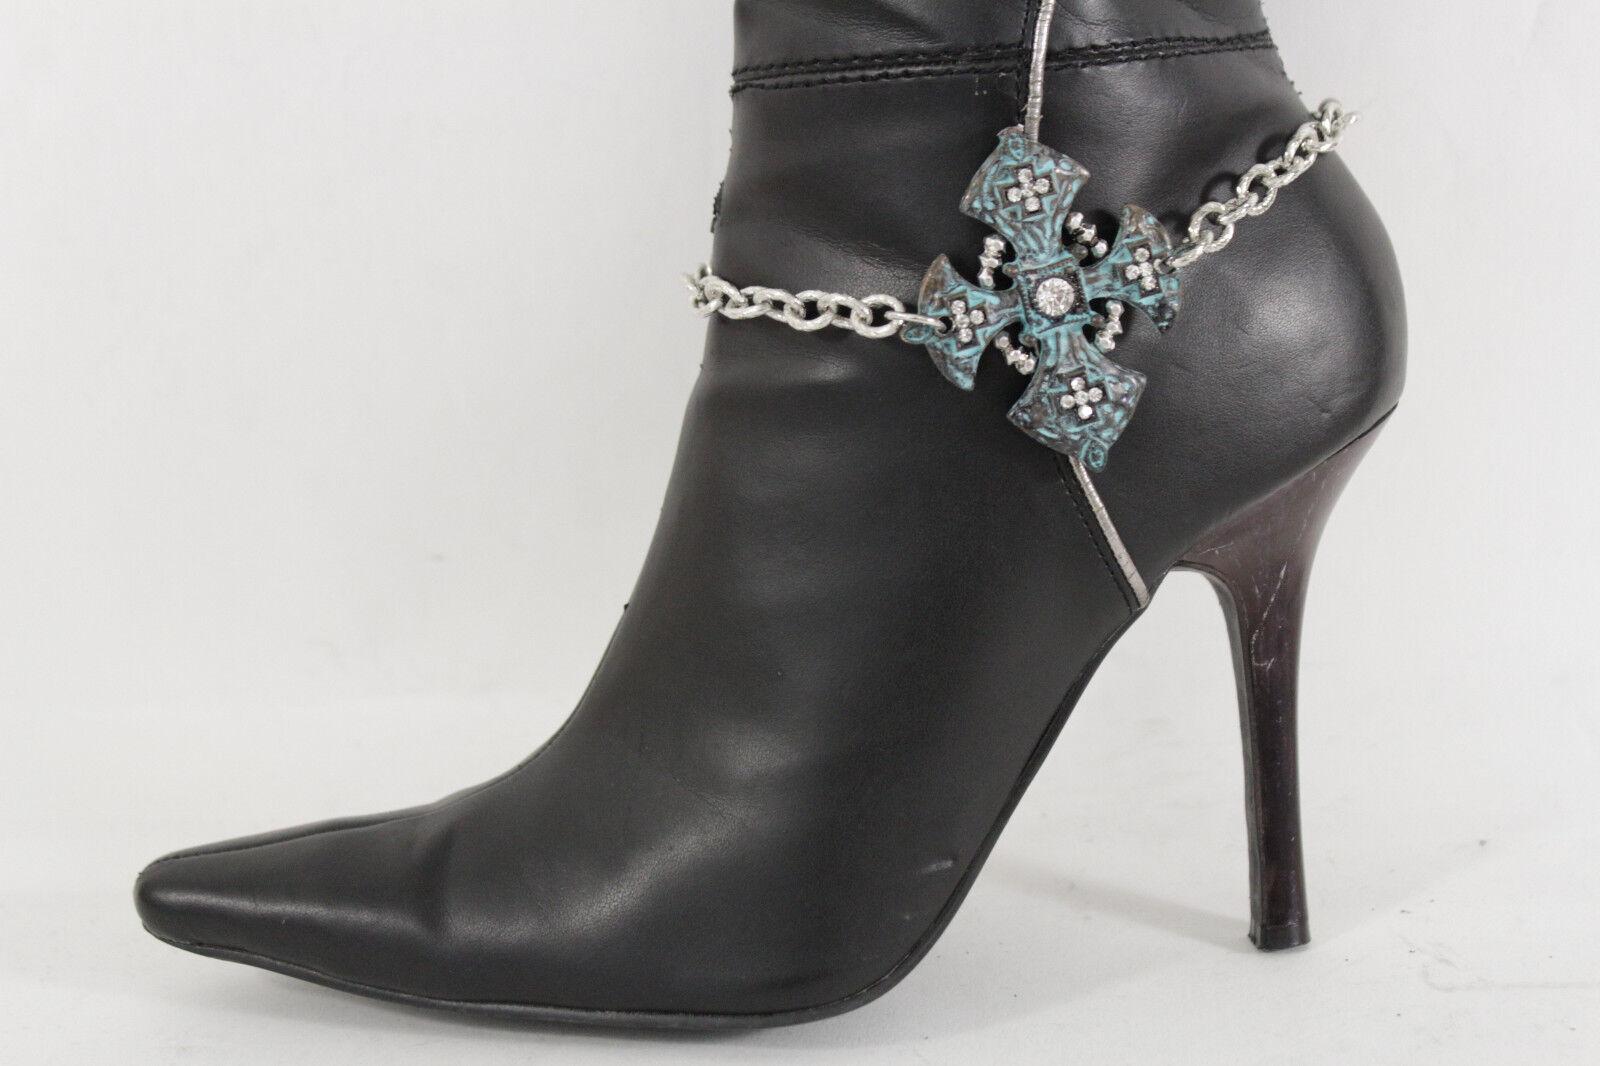 Women Boot Bracelet Silver Metal Chain Vintage Turquoise Cross Anklet Shoe Charm